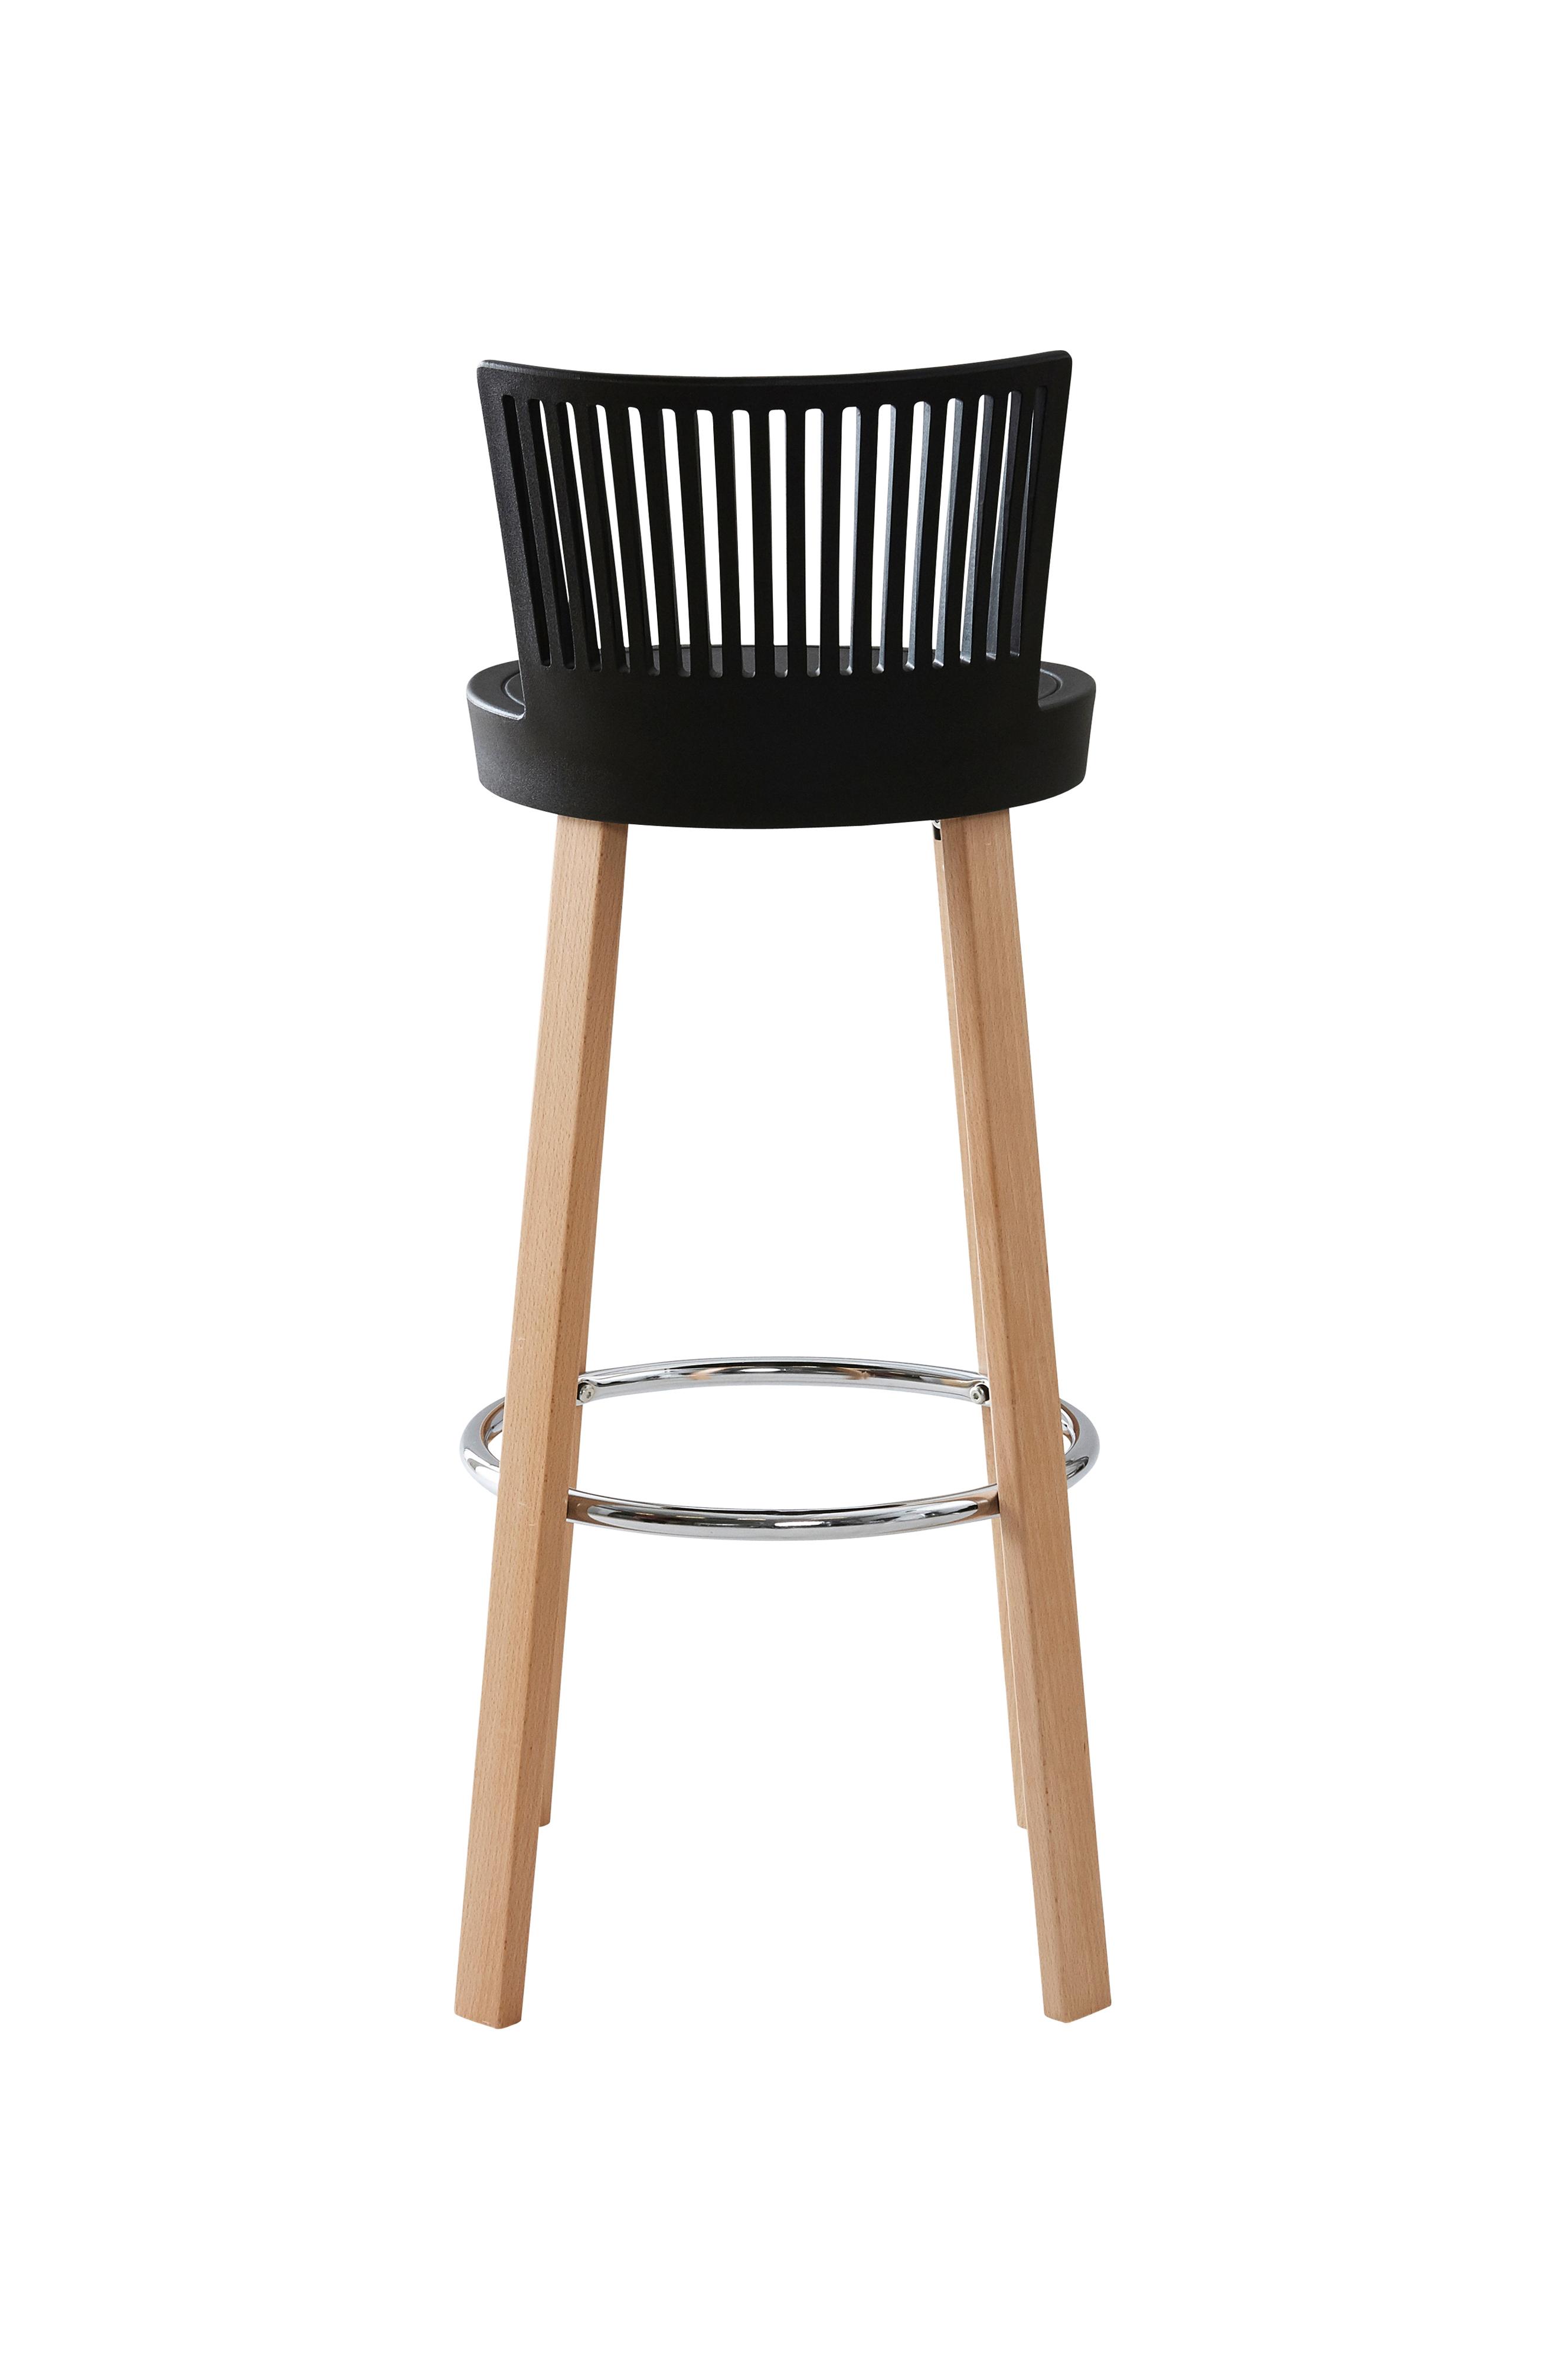 Kända Getinge GETINGE barstol 2-pack - Vit - Möbler - Jotex.se FK-43